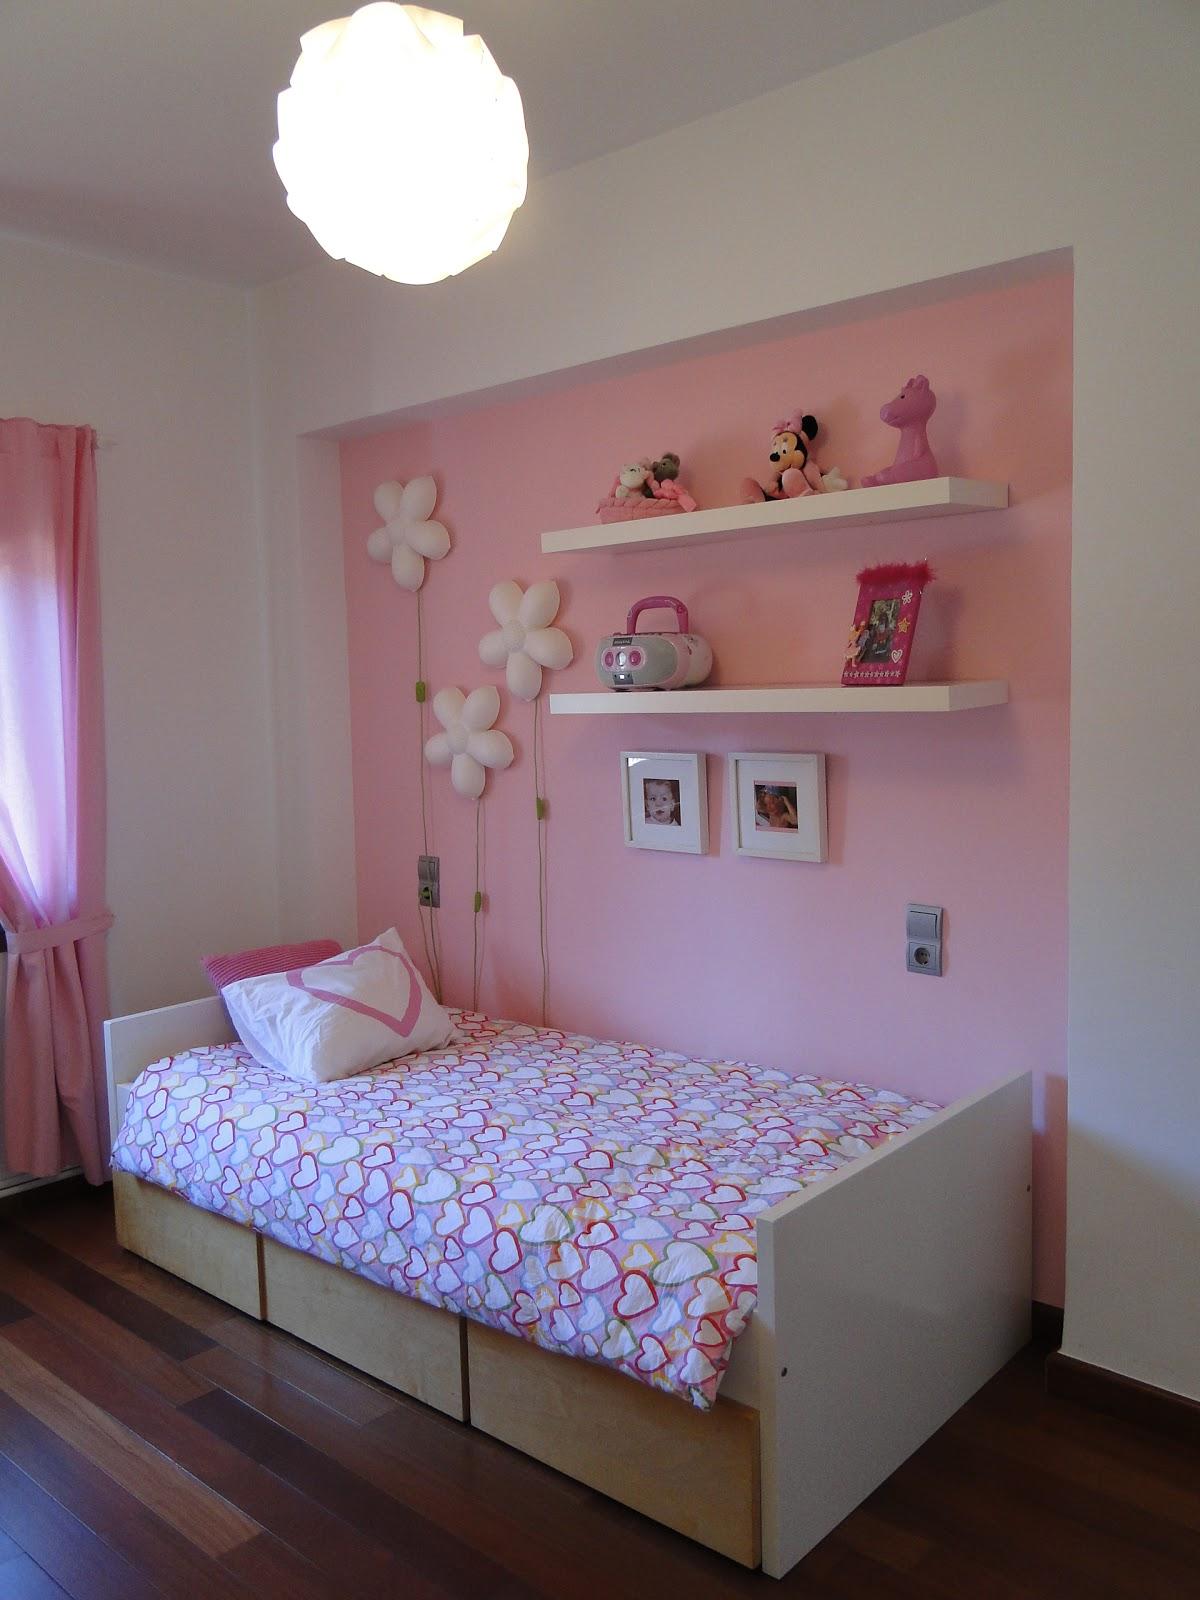 Planos low cost habitaci n infantil en rosa - Habitacion infantil rosa ...